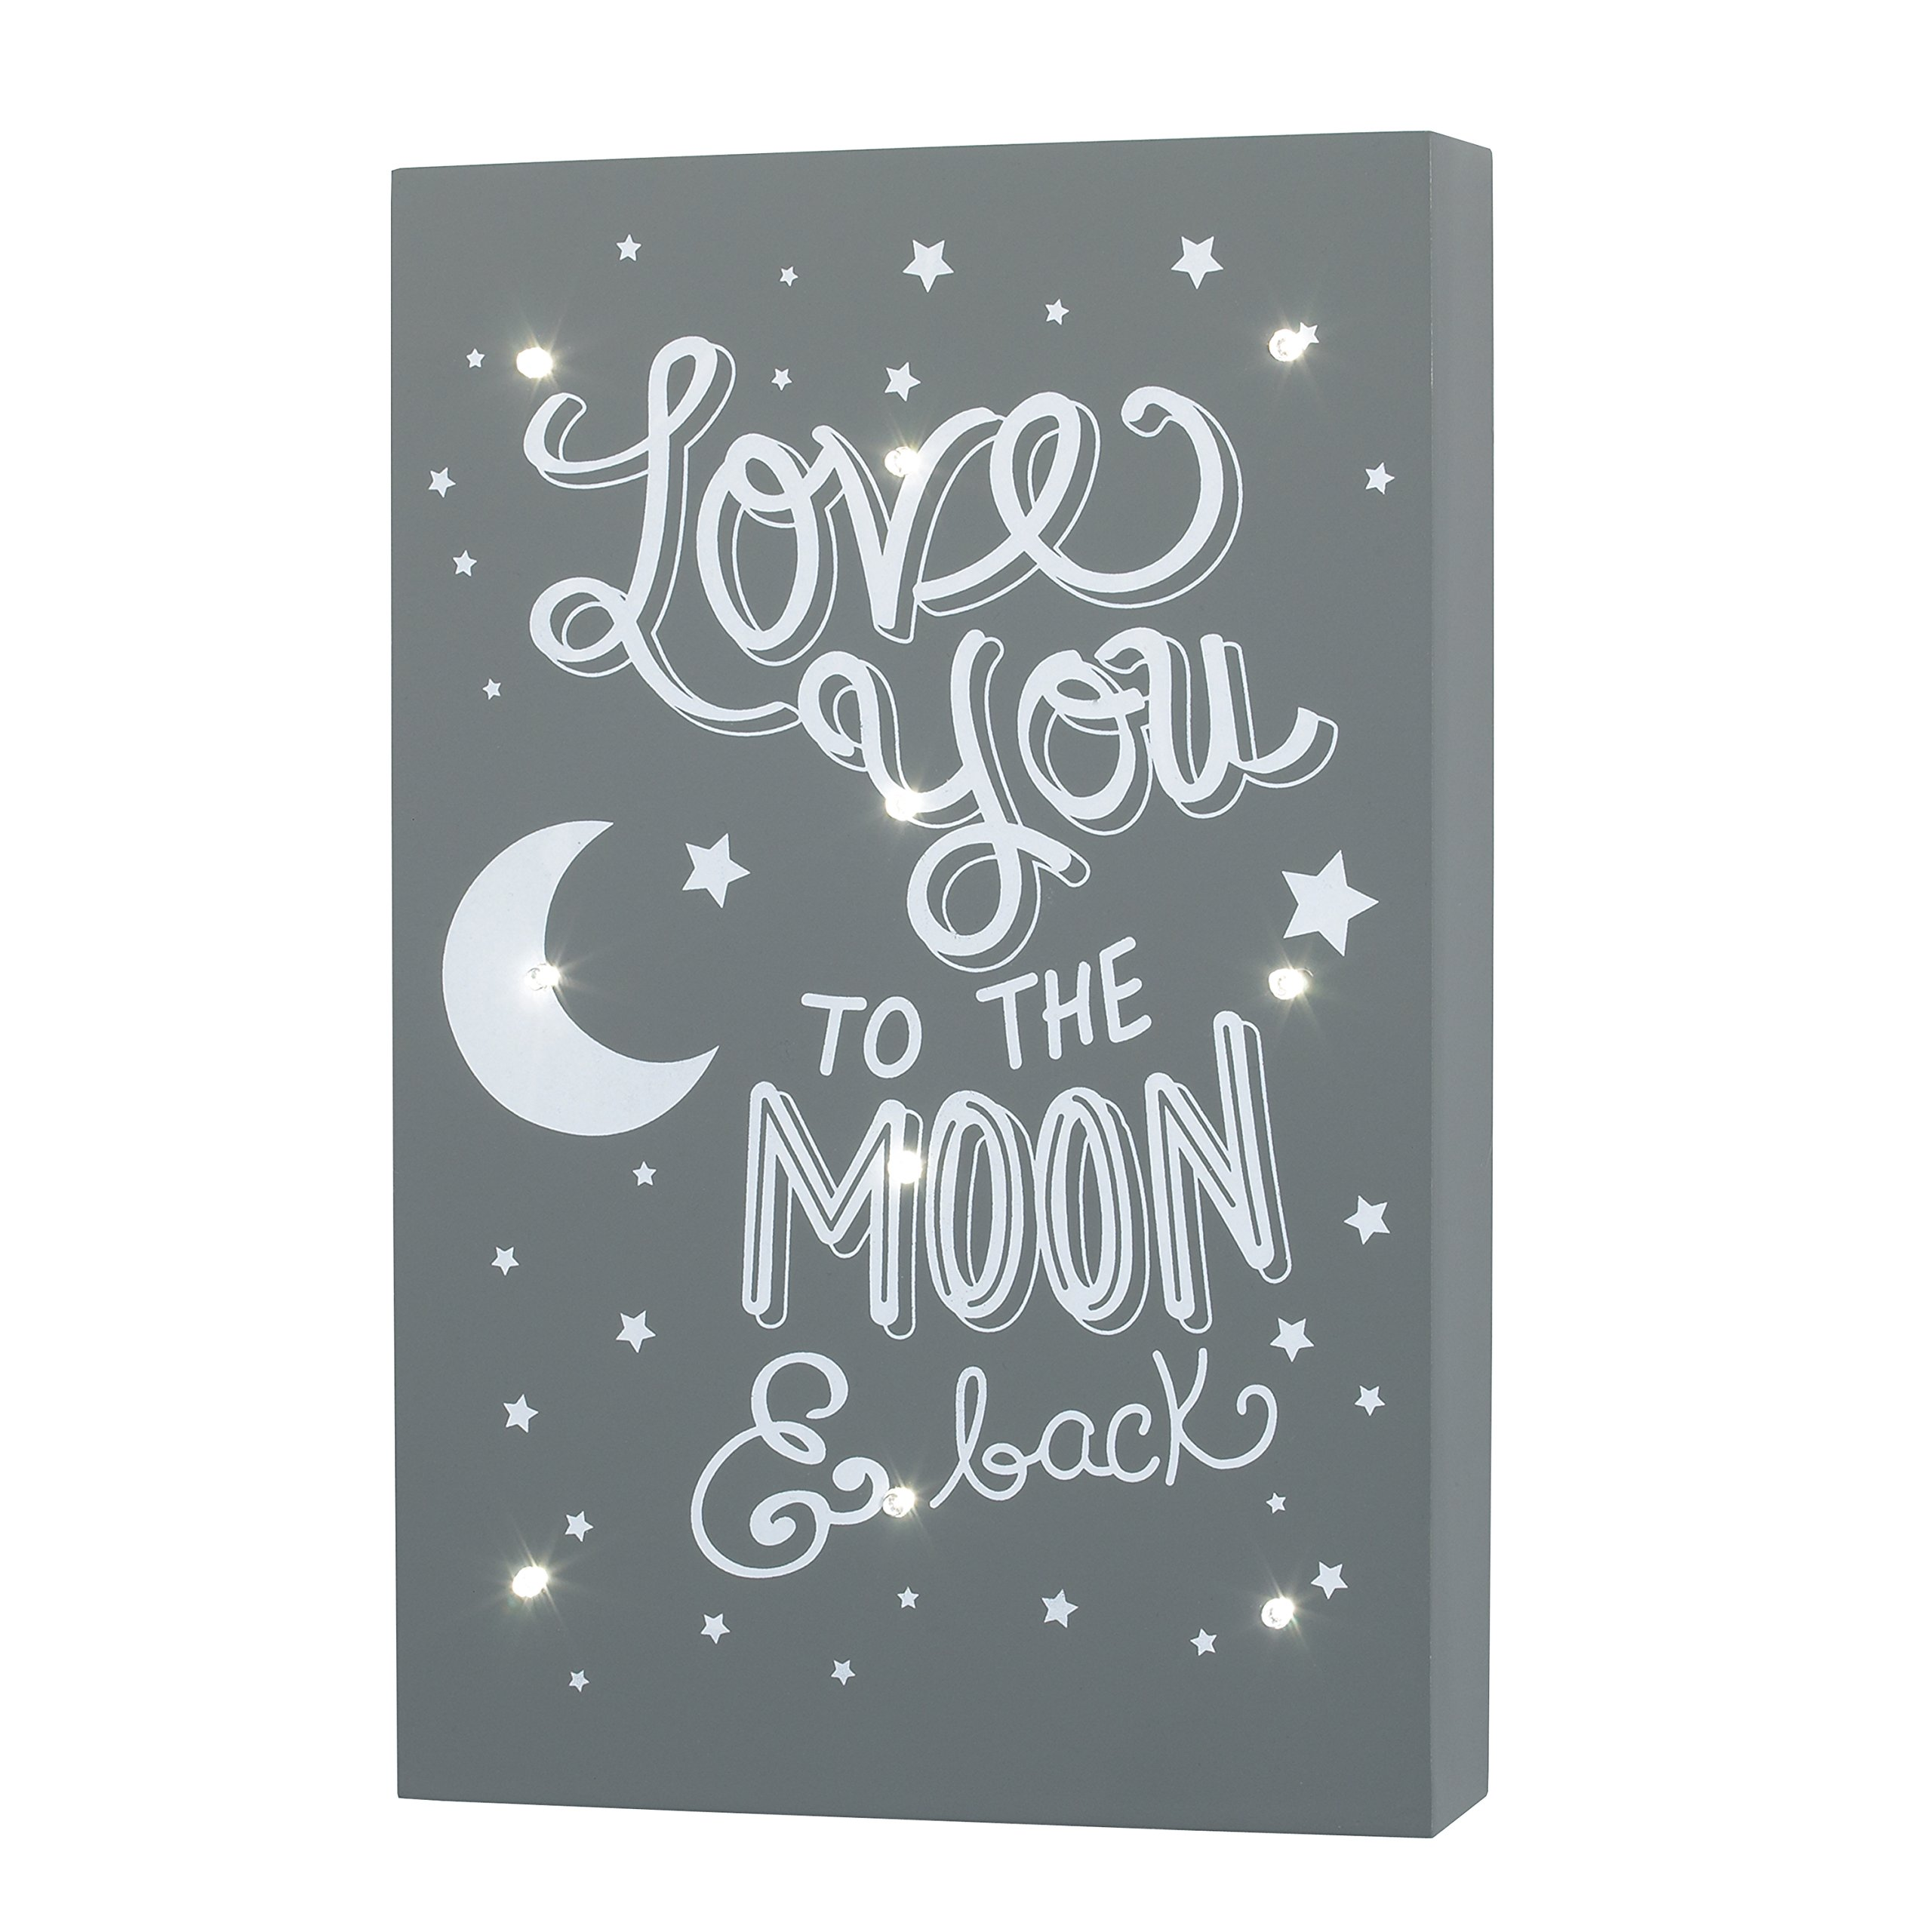 Cheap Scorpio Moon Man In Love, find Scorpio Moon Man In Love deals